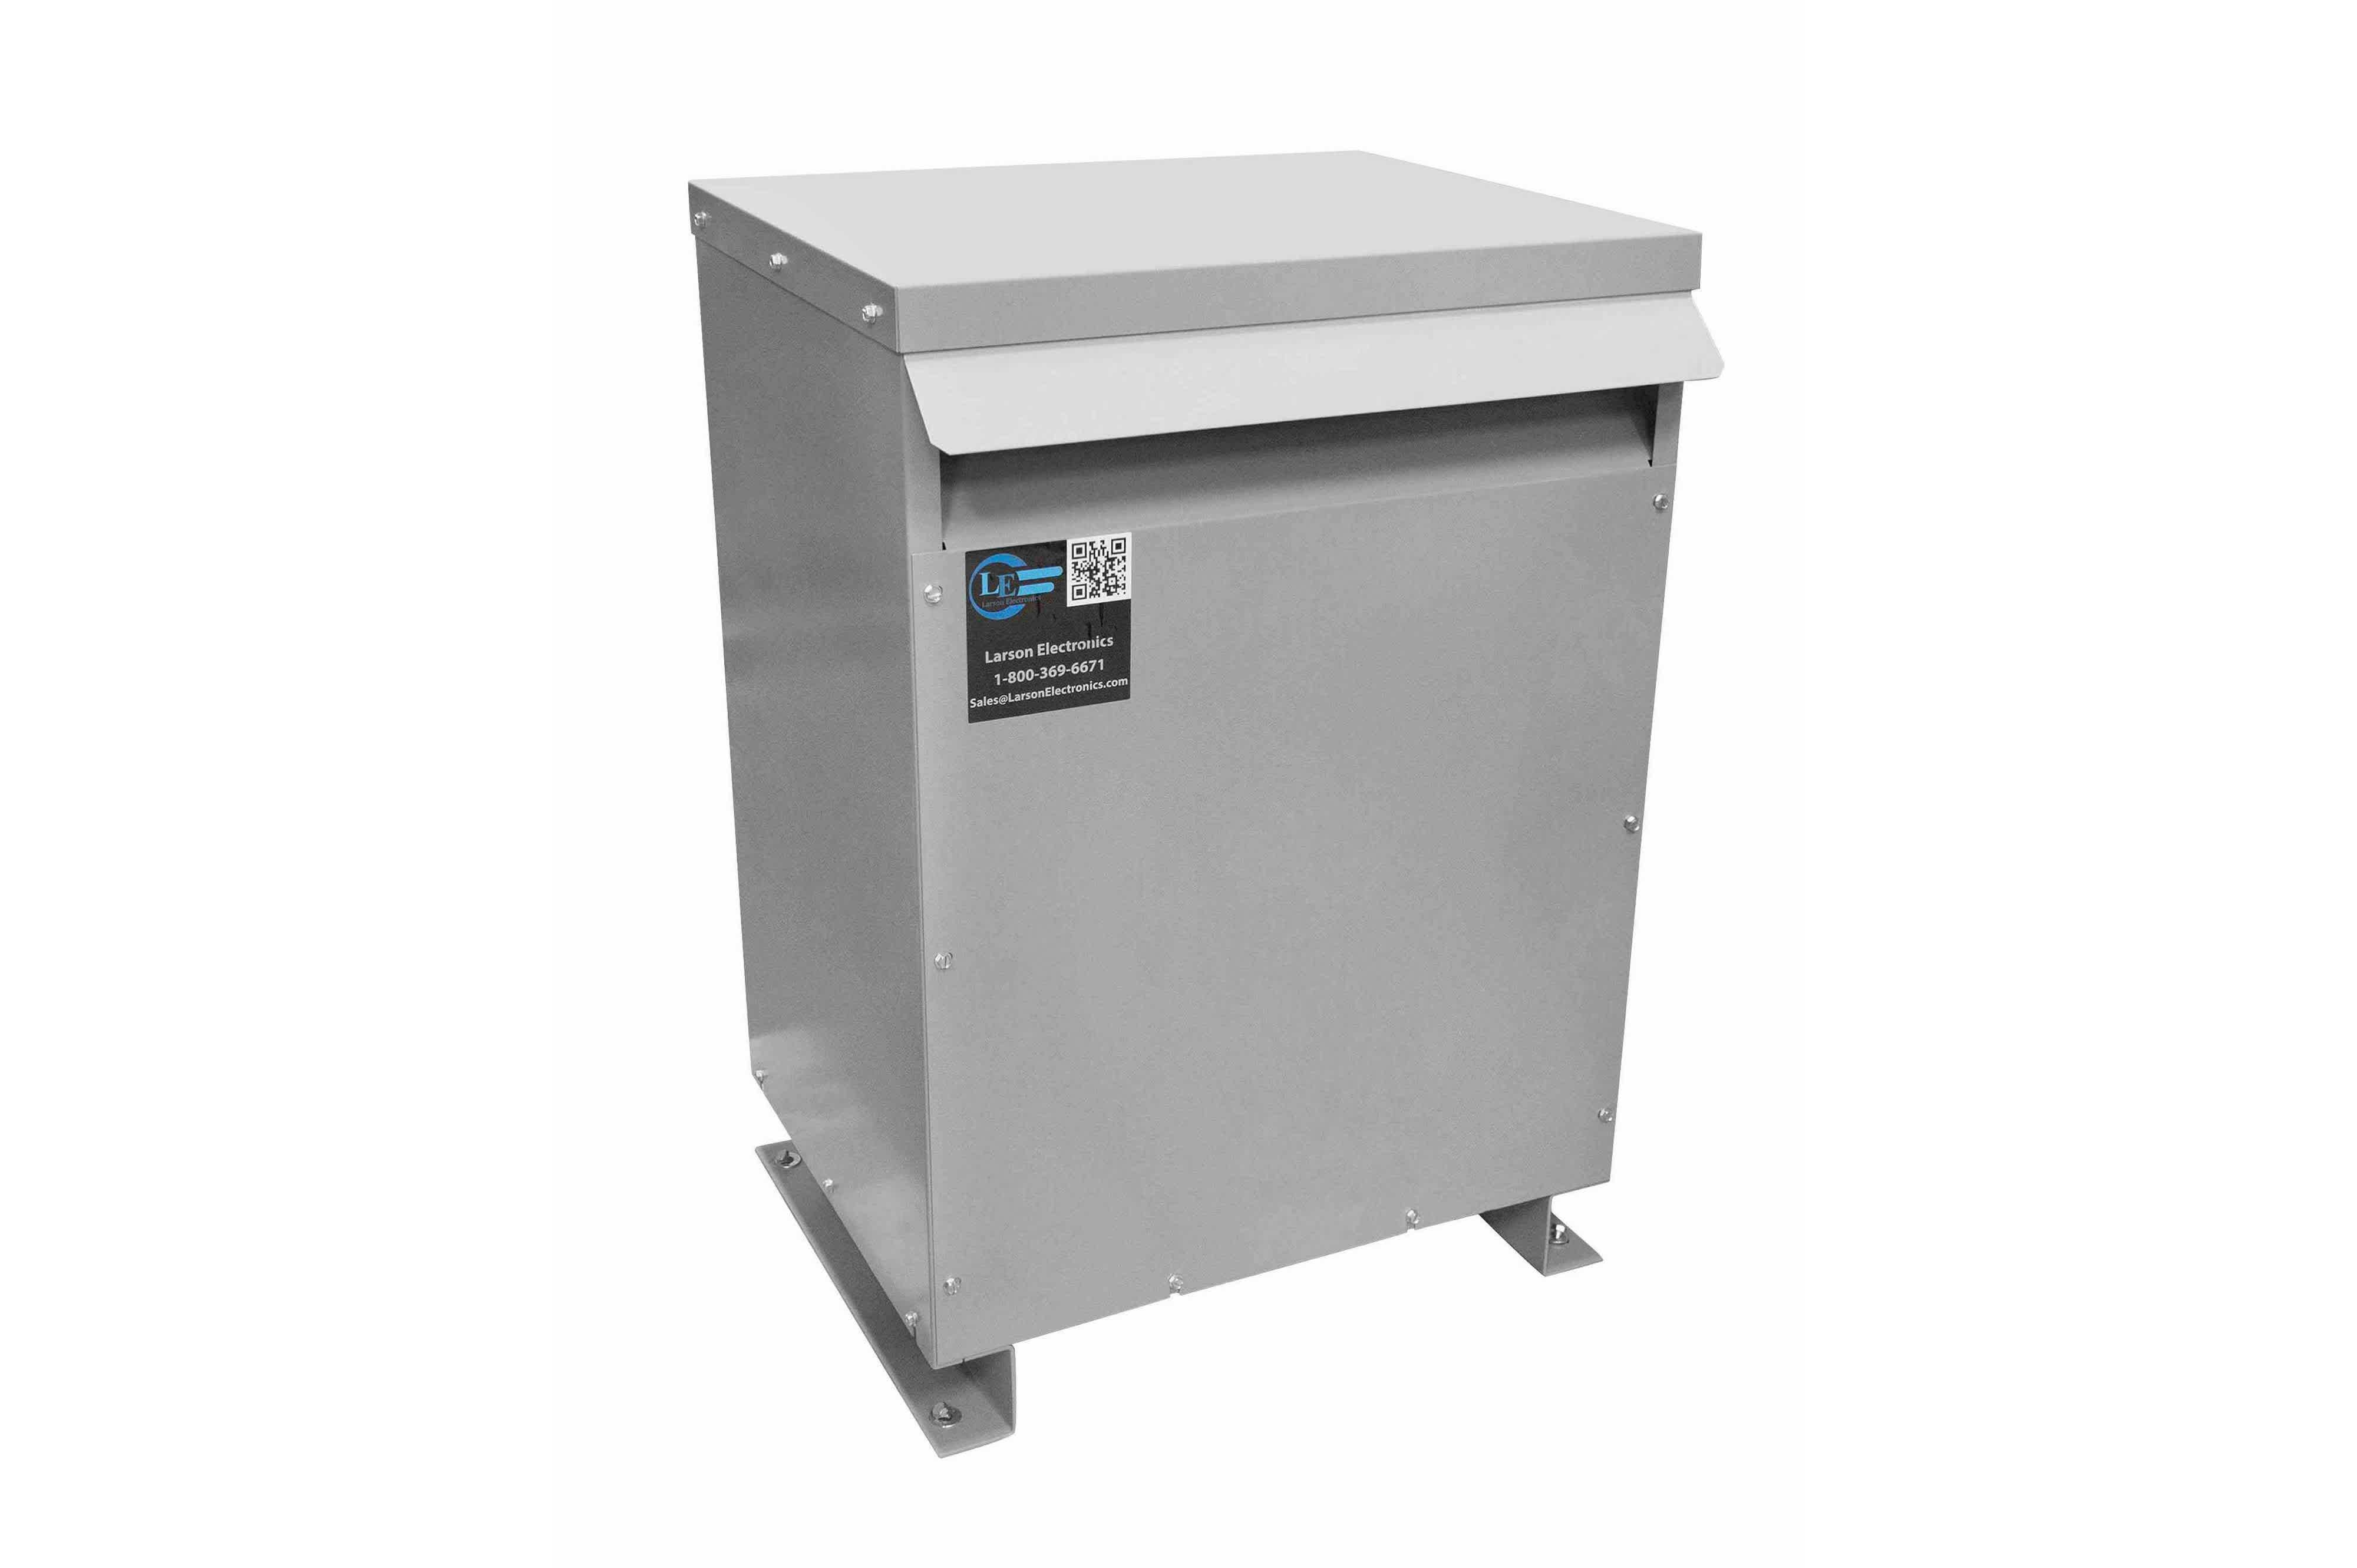 12 kVA 3PH Isolation Transformer, 400V Wye Primary, 480V Delta Secondary, N3R, Ventilated, 60 Hz